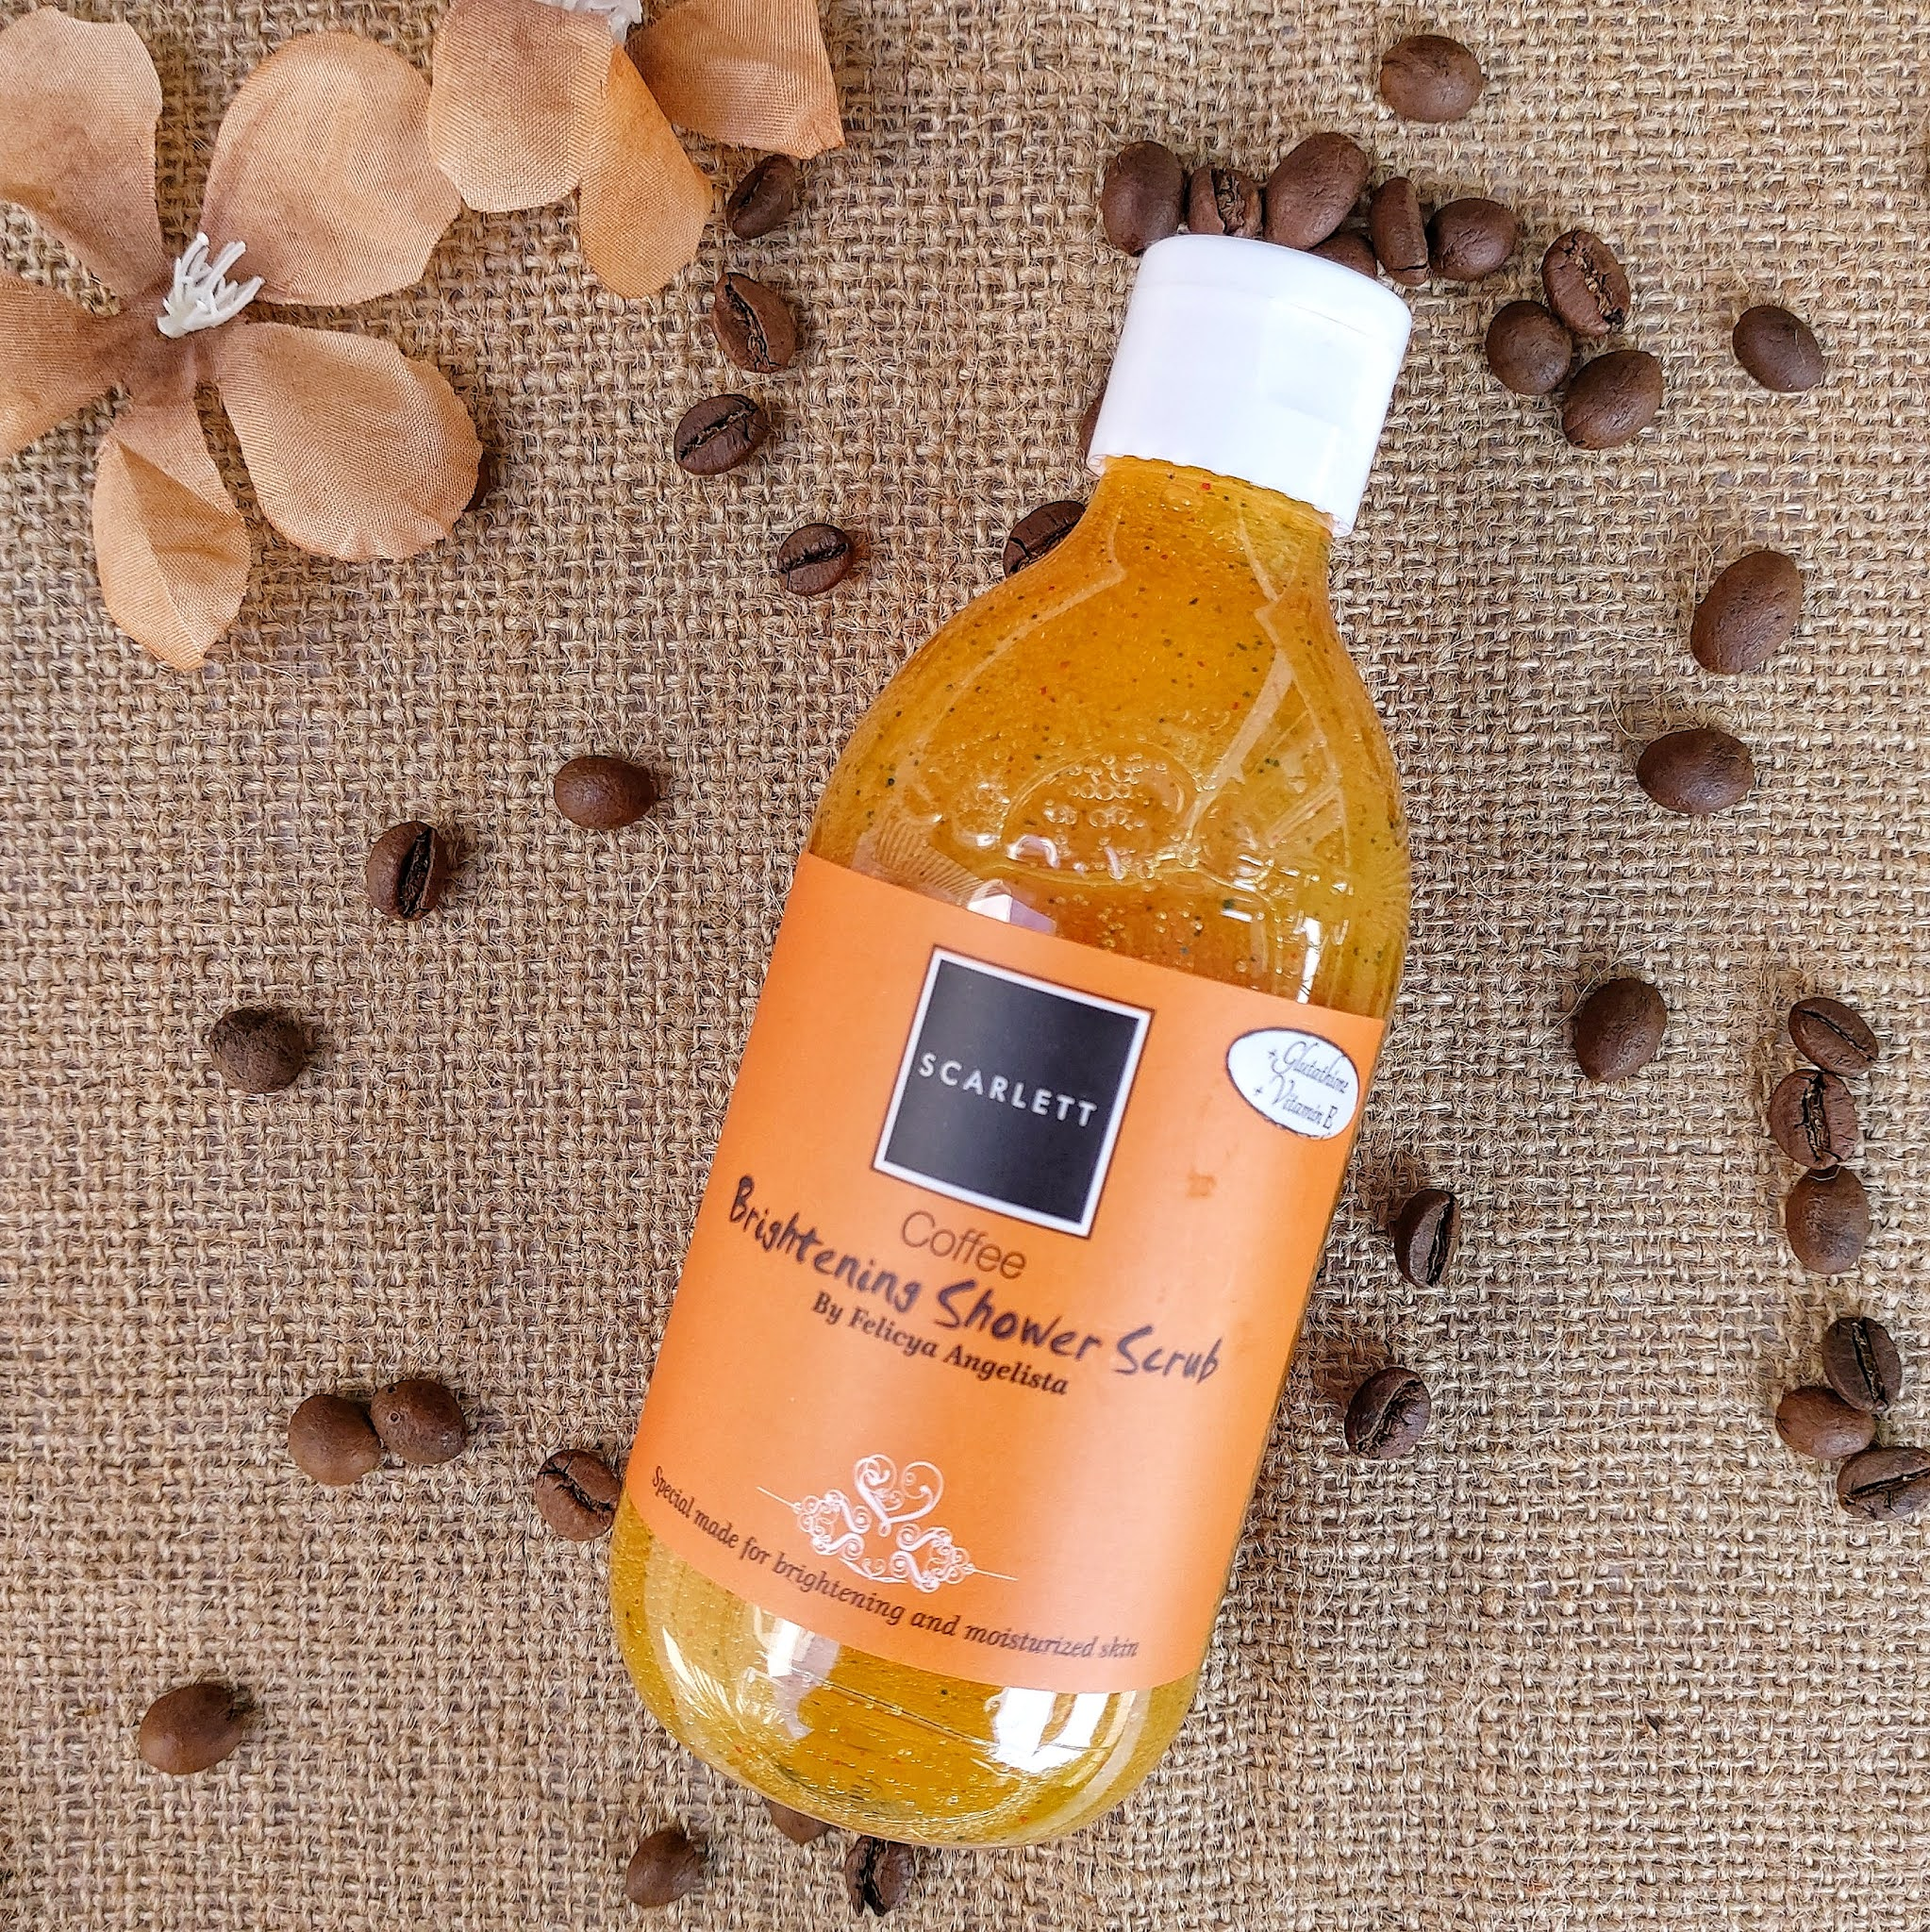 scarlett-brightening-shower-scrub-coffee